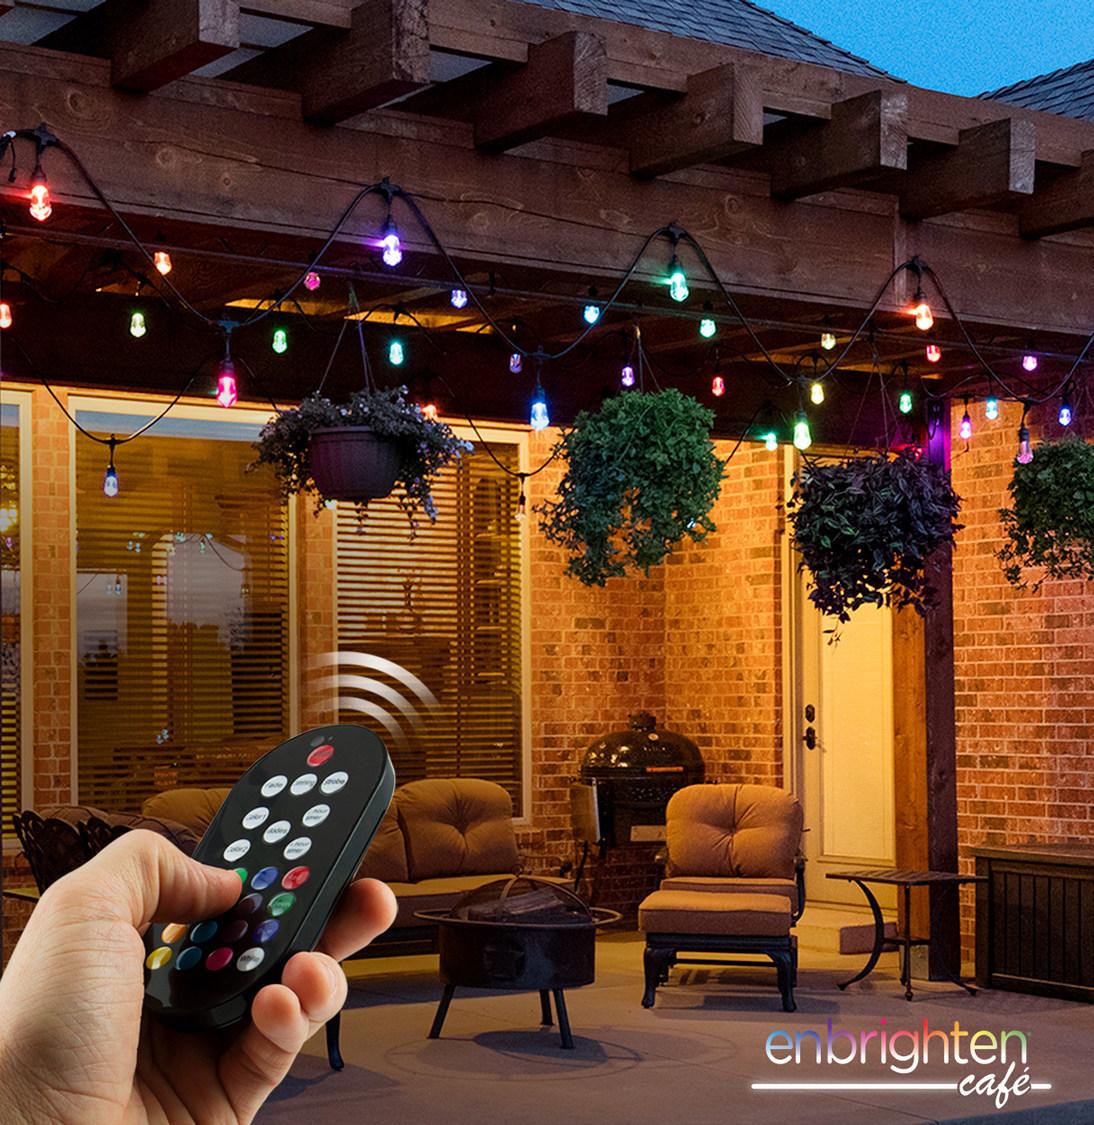 Enbrighten Outdoor String Lights: Enbrighten Seasons Café Lights Are The Next Big Thing In